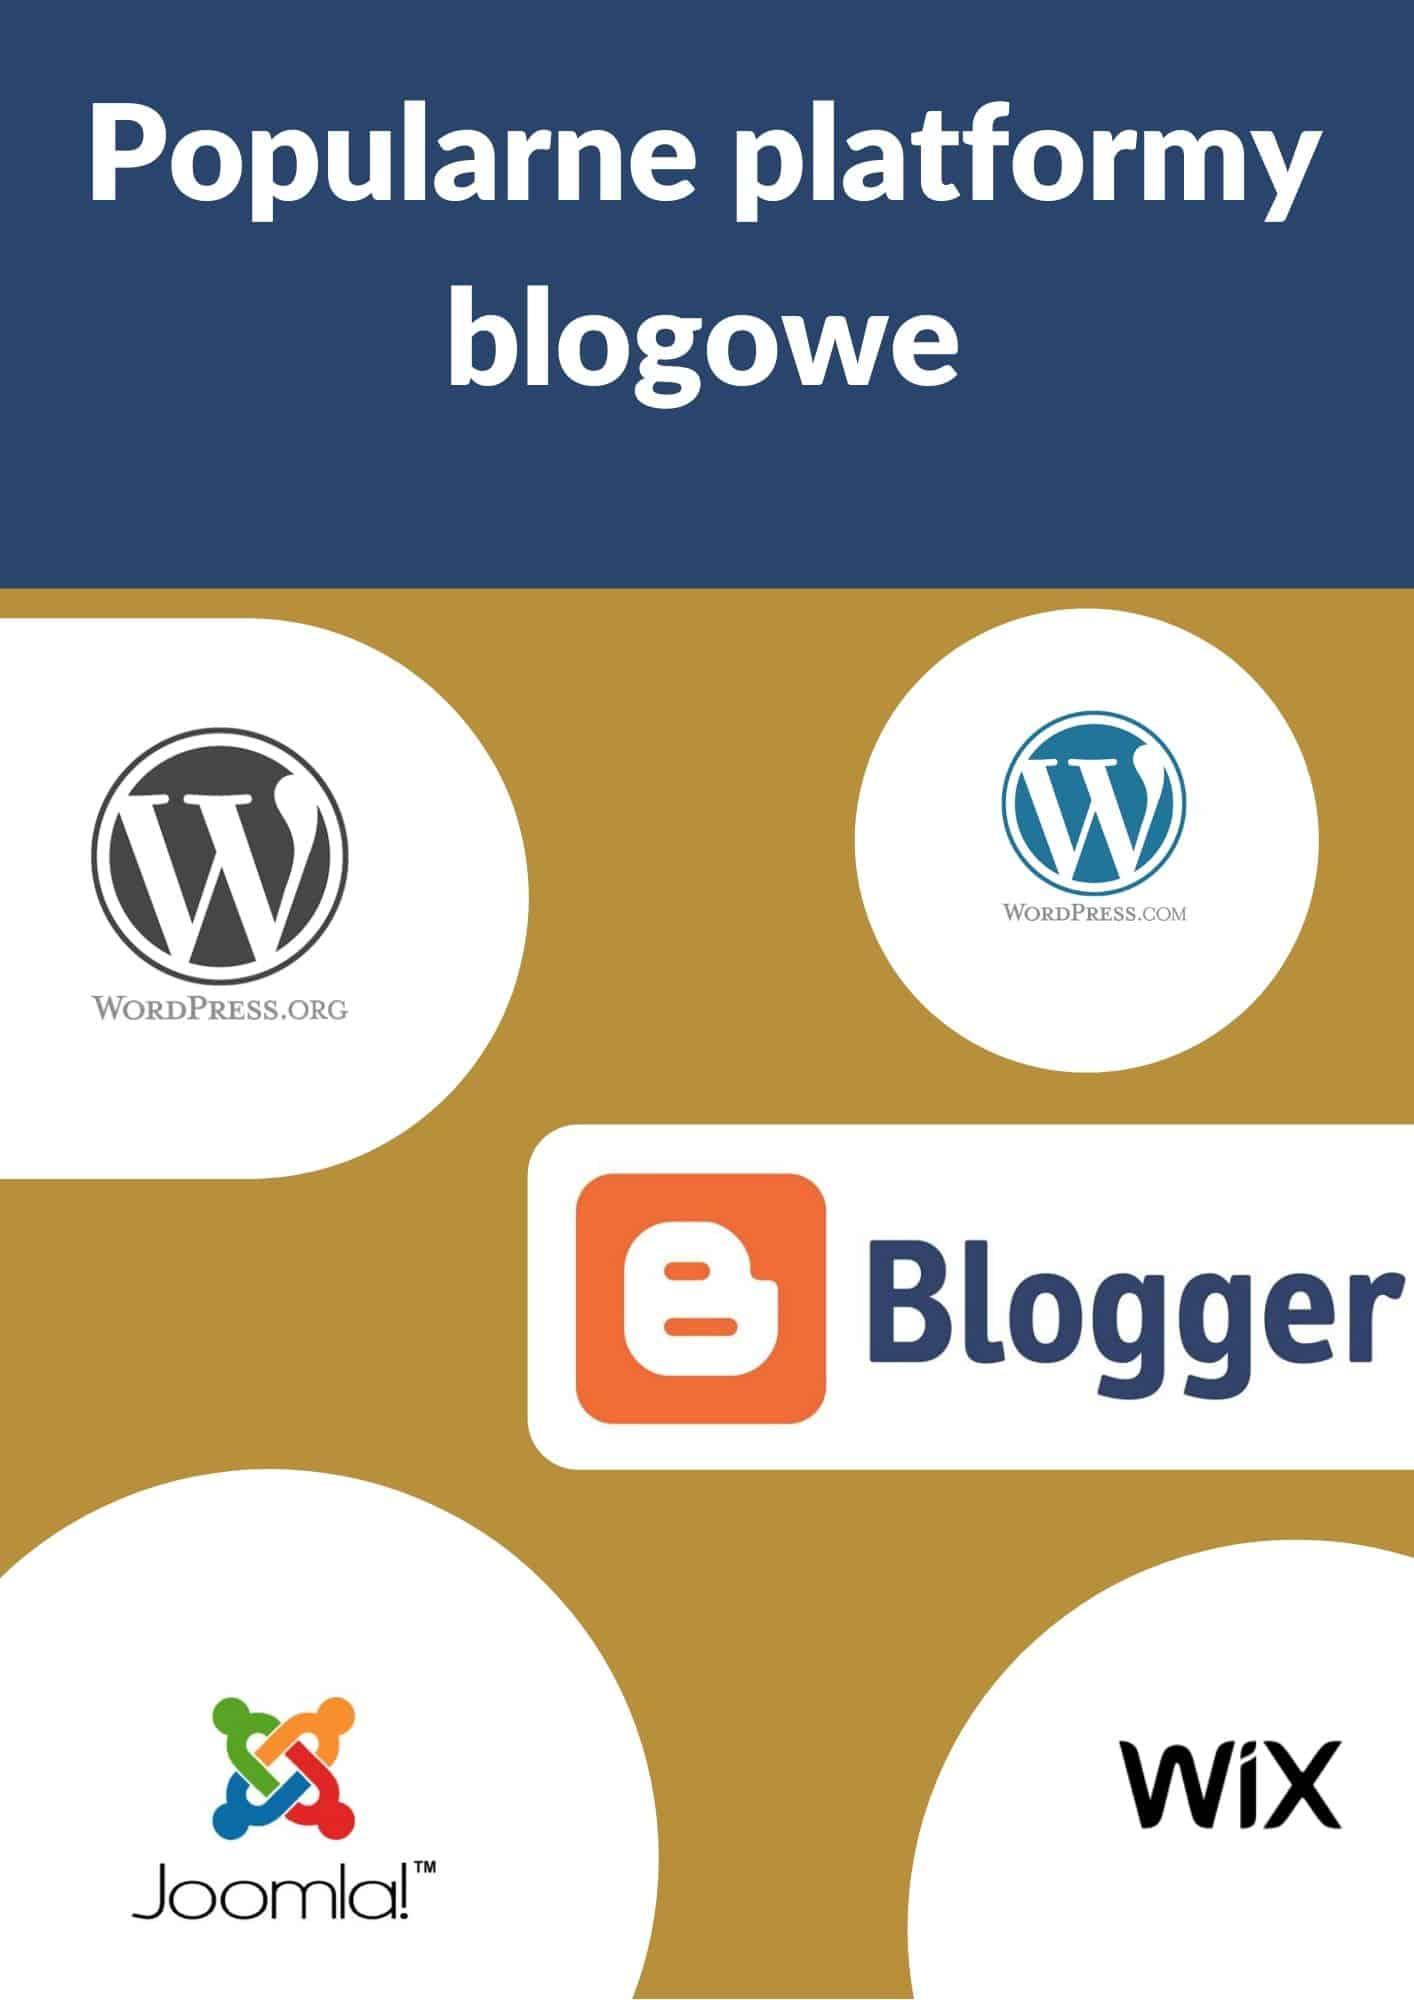 platformy blogowe